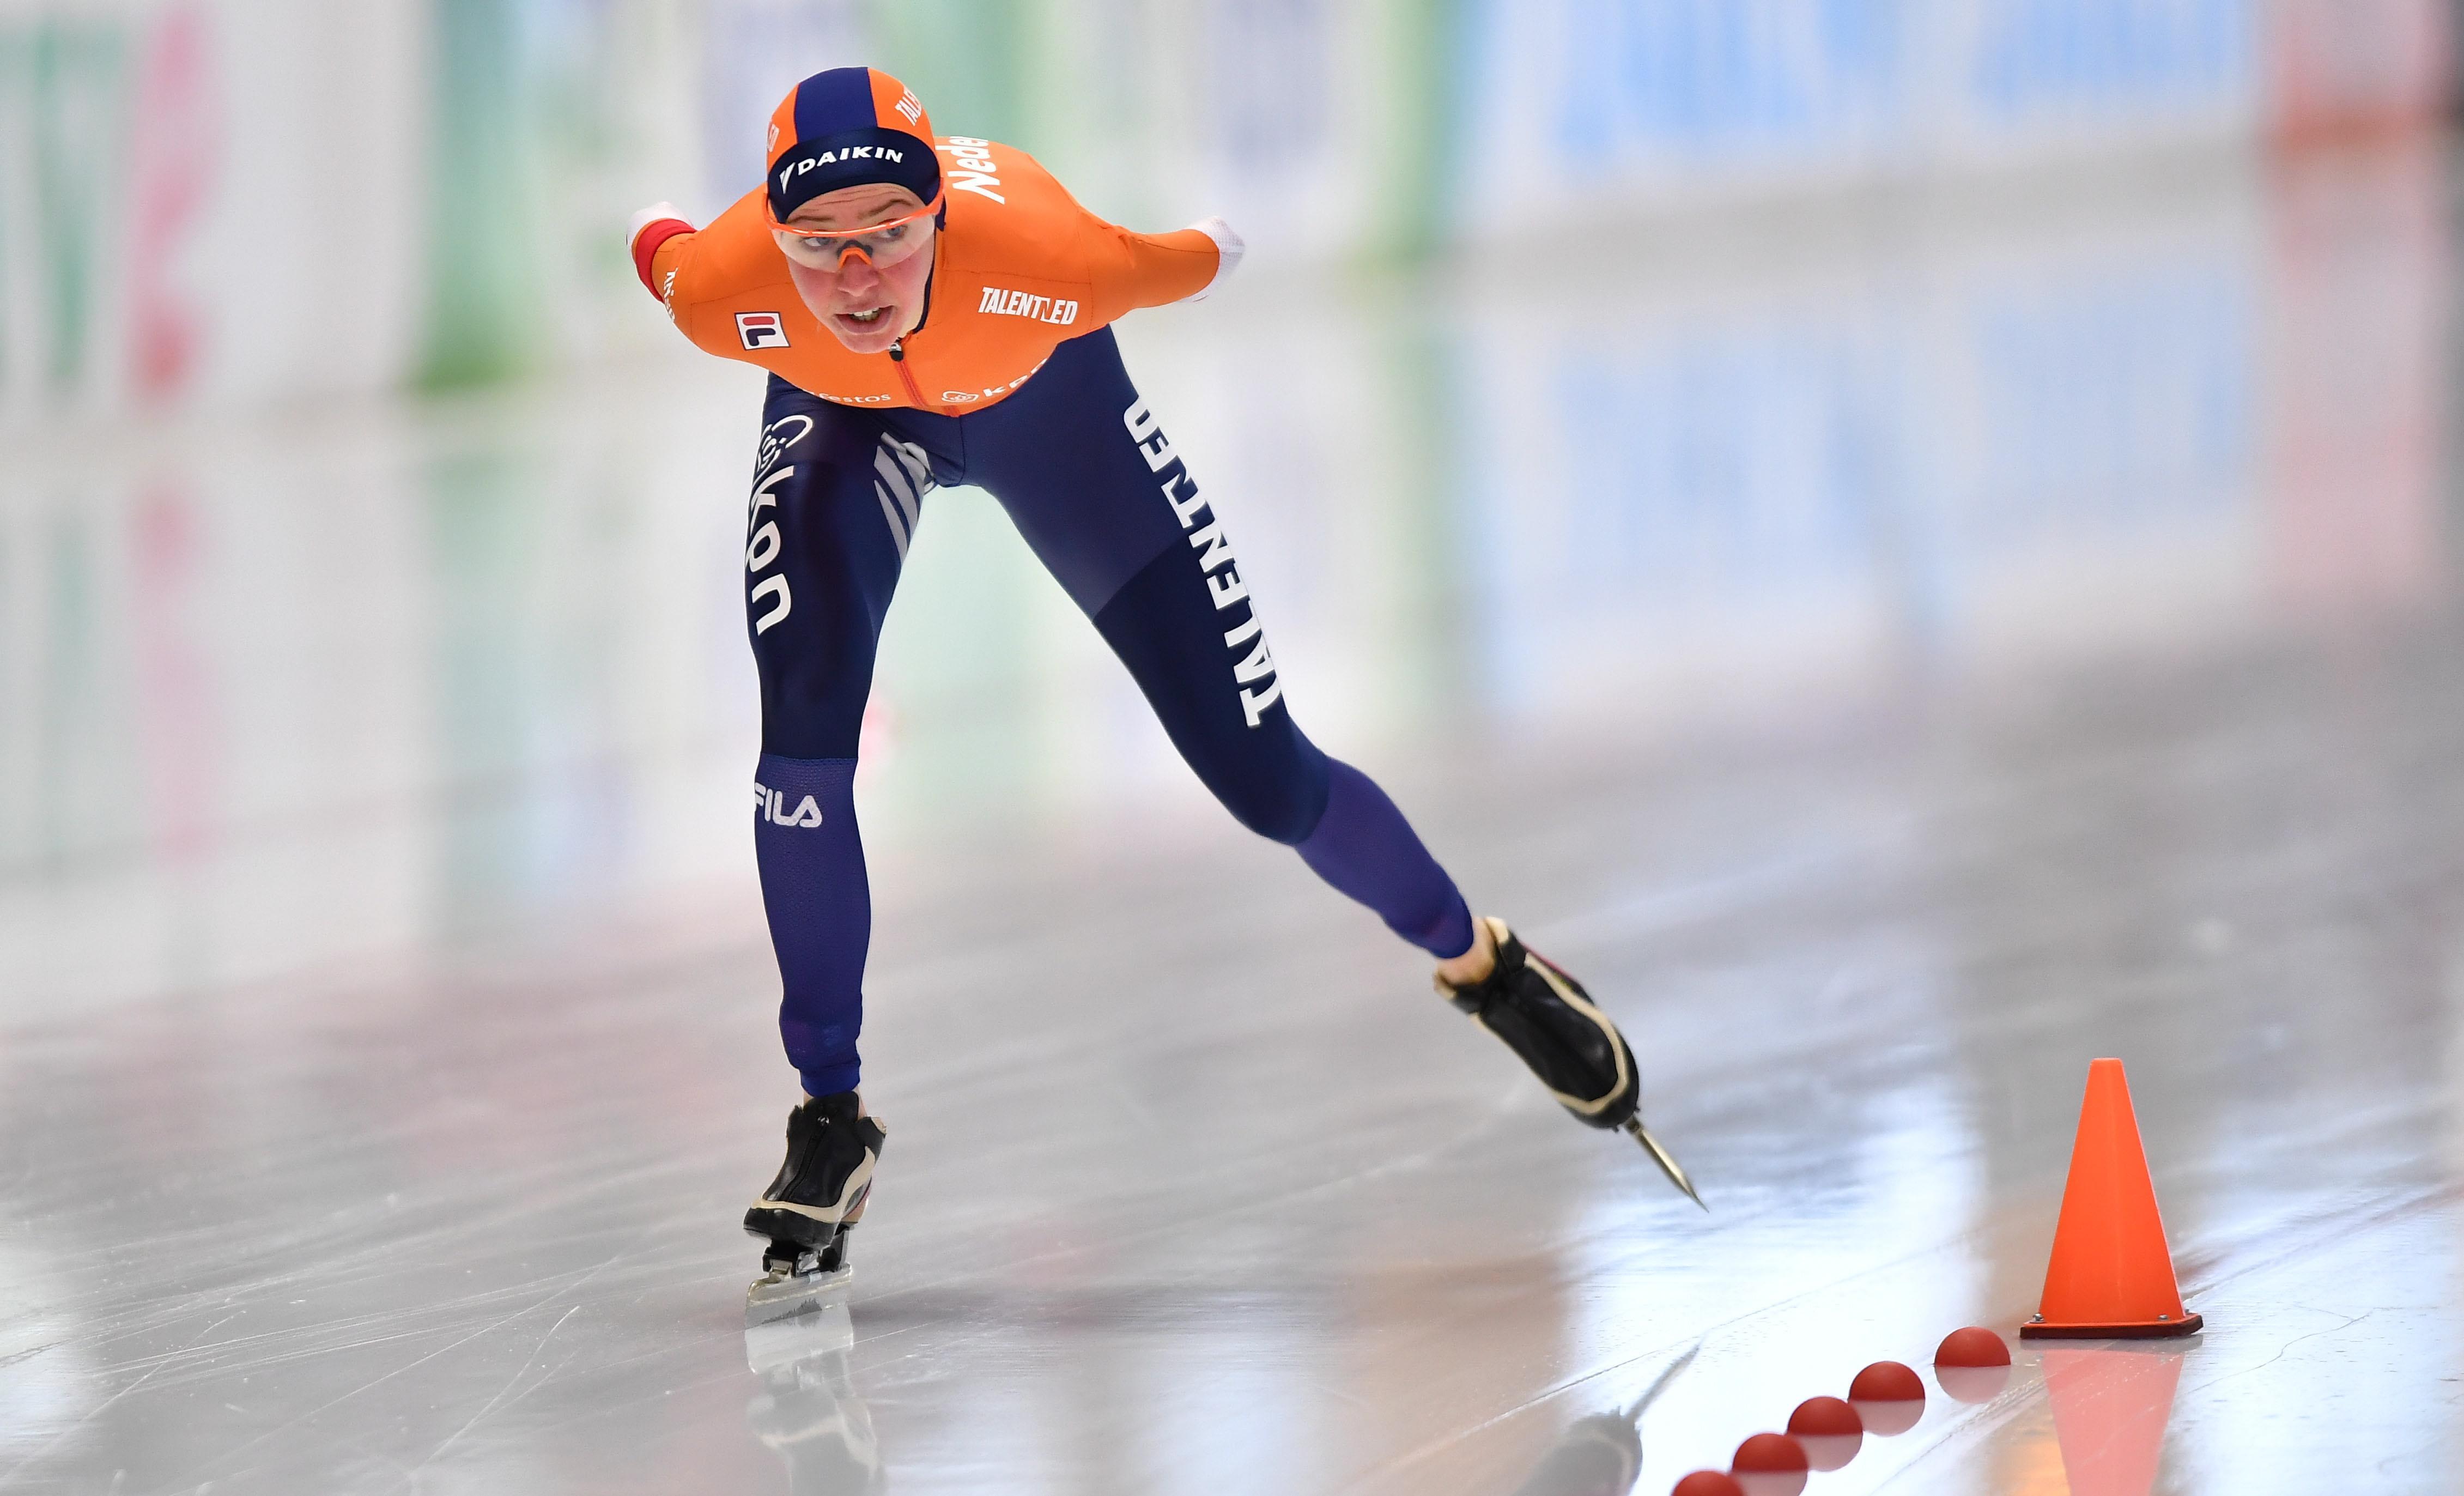 Esmee Visser verbetert nationaal record op 3000 meter